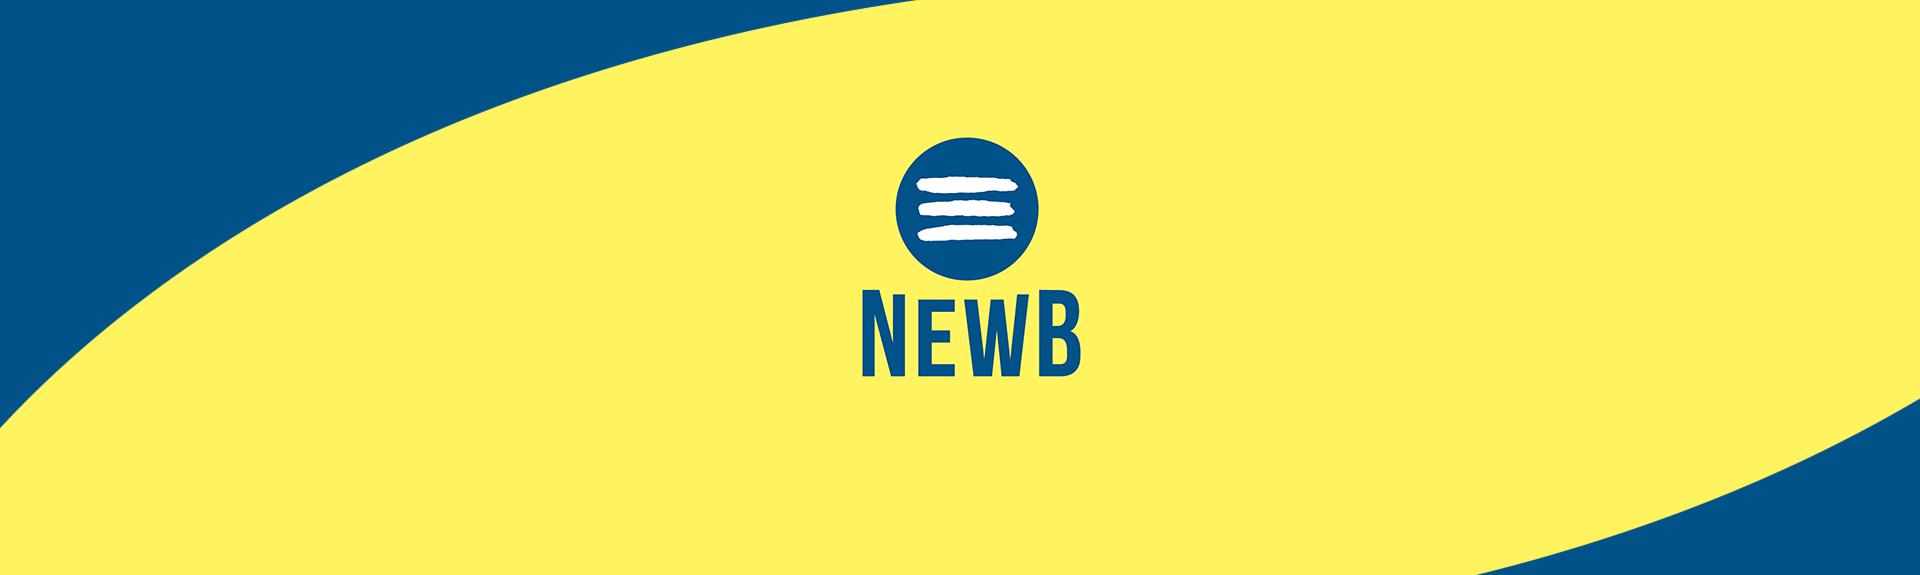 finance&invest.brussels soutient NewB